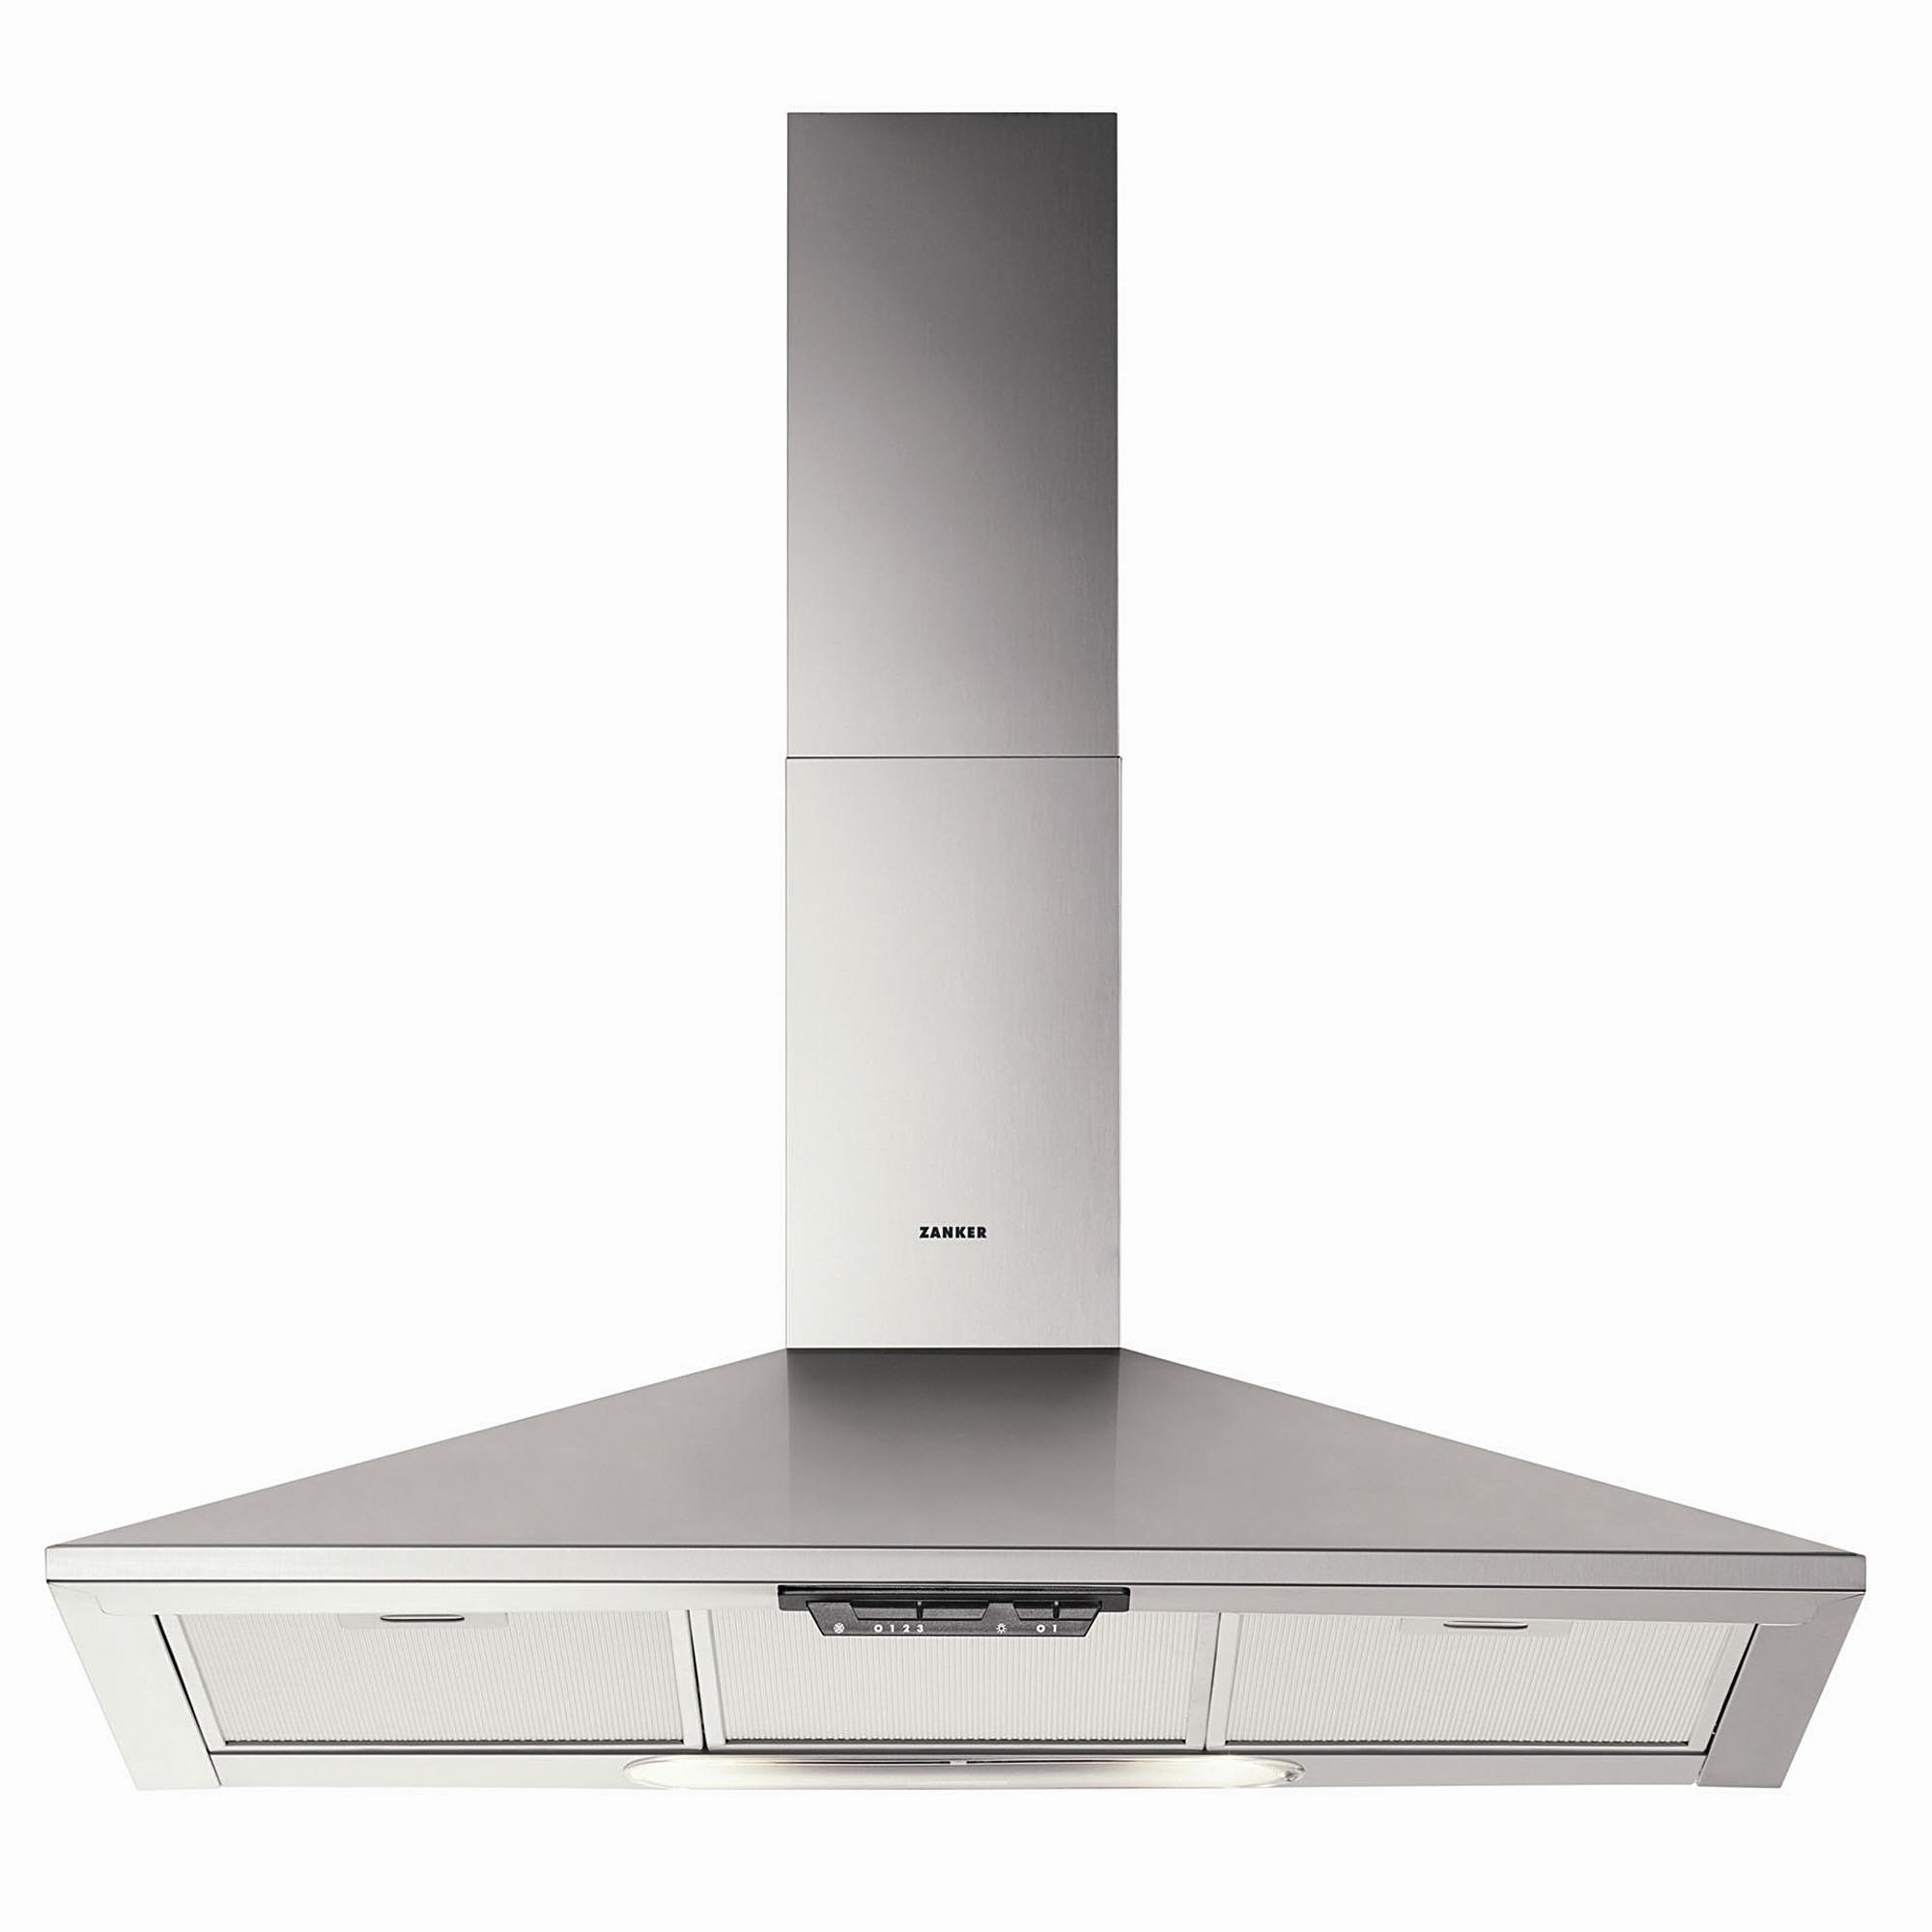 hotte chemin e zkc9141x zanker 90 cm inox hottes electrom nager cuisines. Black Bedroom Furniture Sets. Home Design Ideas